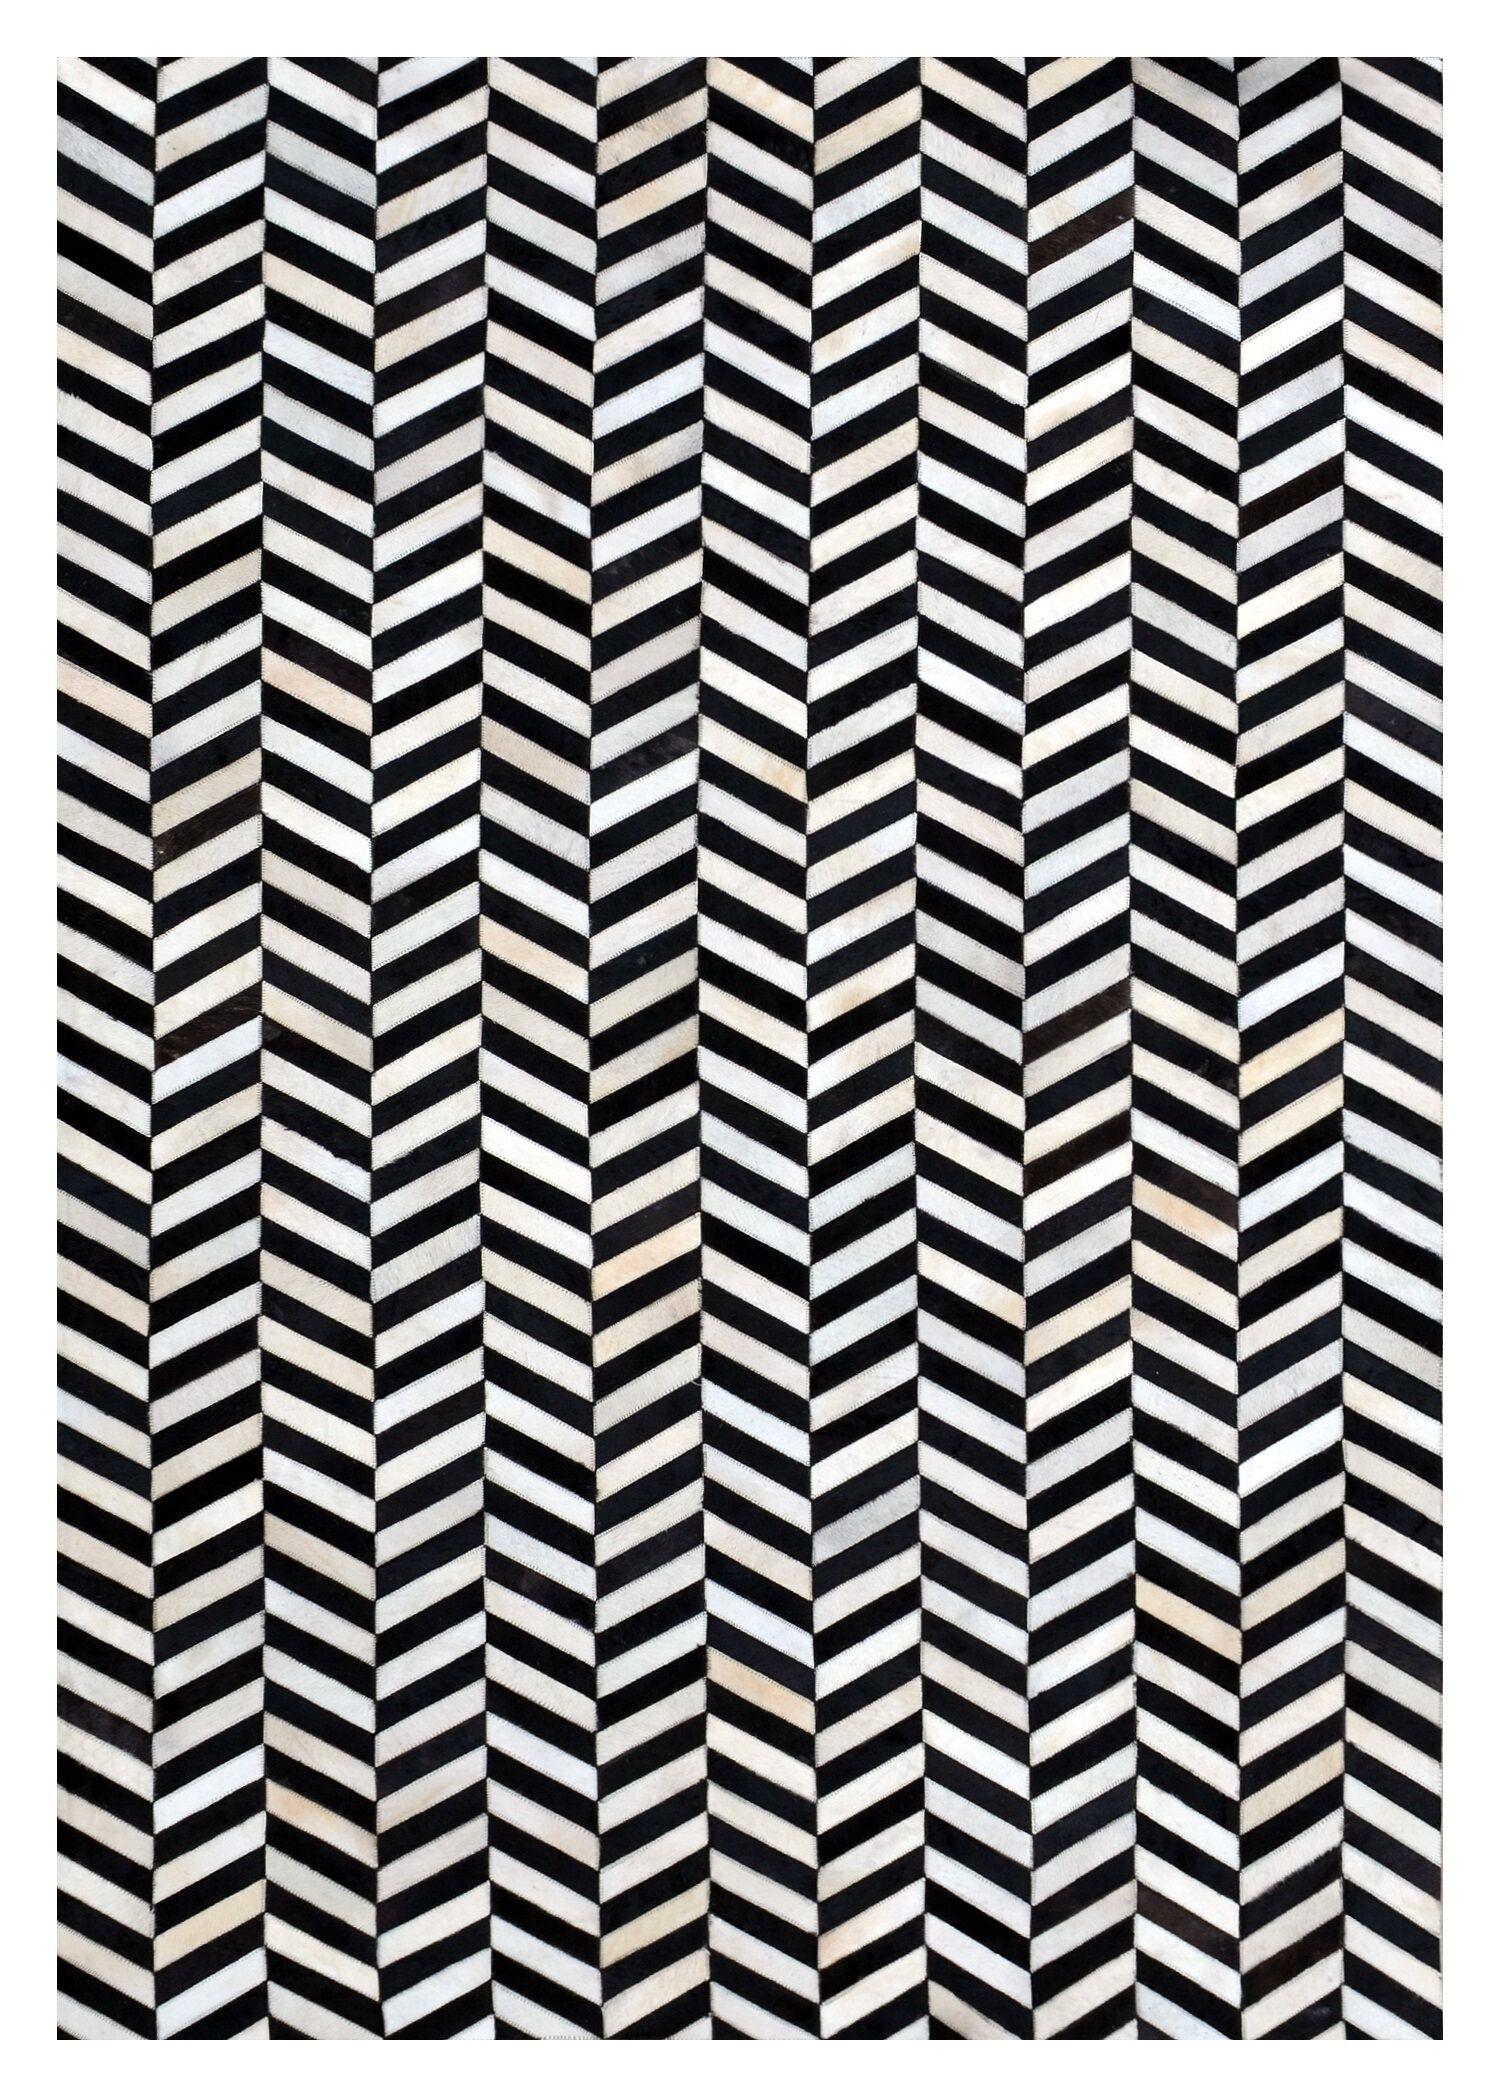 Chantay Chevron Hand Woven Cowhide Black/Ivory Area Rug Rug Size: Rectangle 8' x 10'